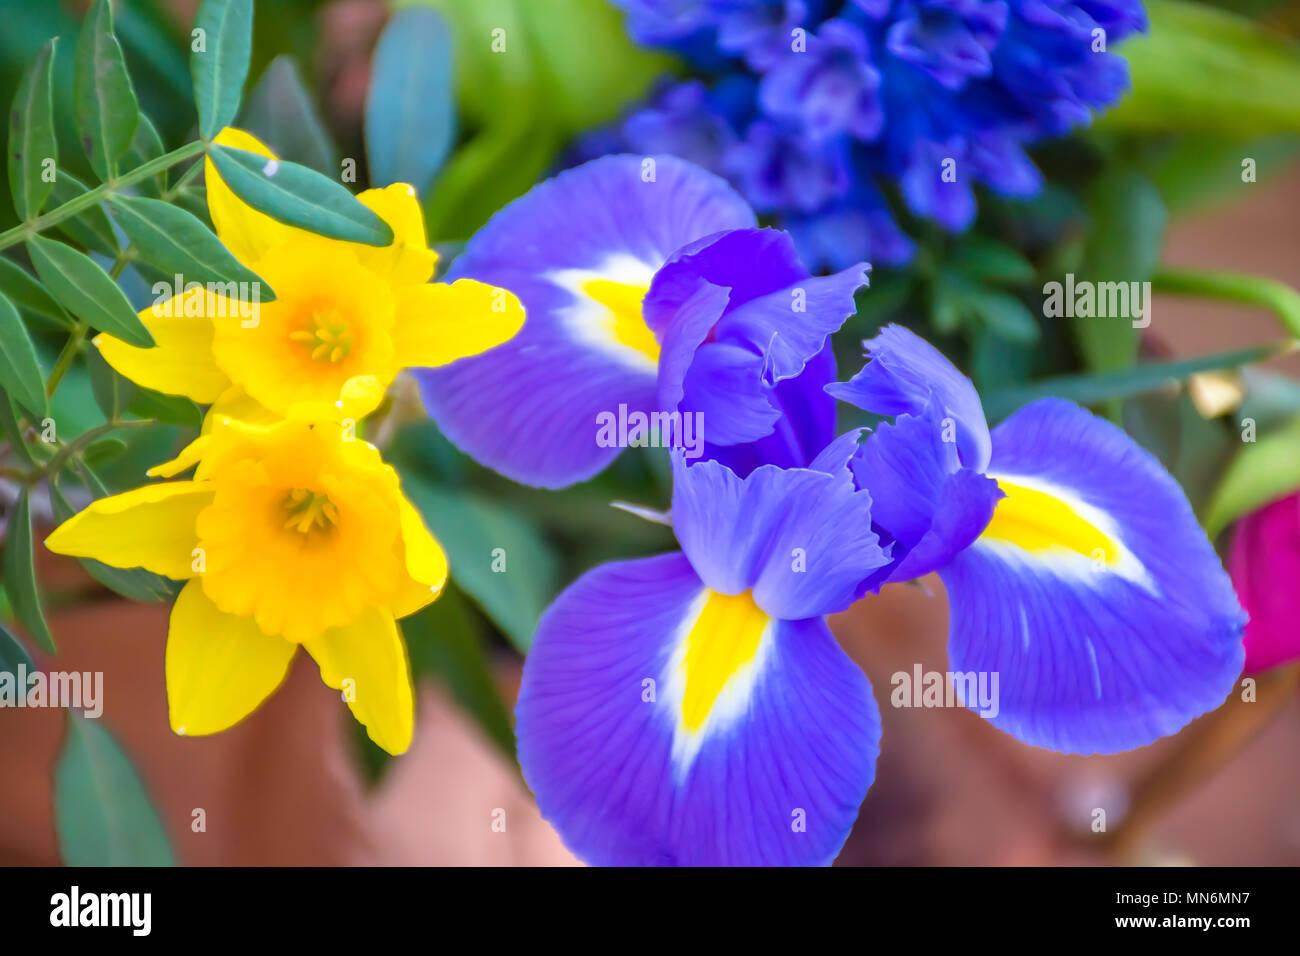 Beautiful Bouquet Of British Spring Flowerspurple Iris And Small